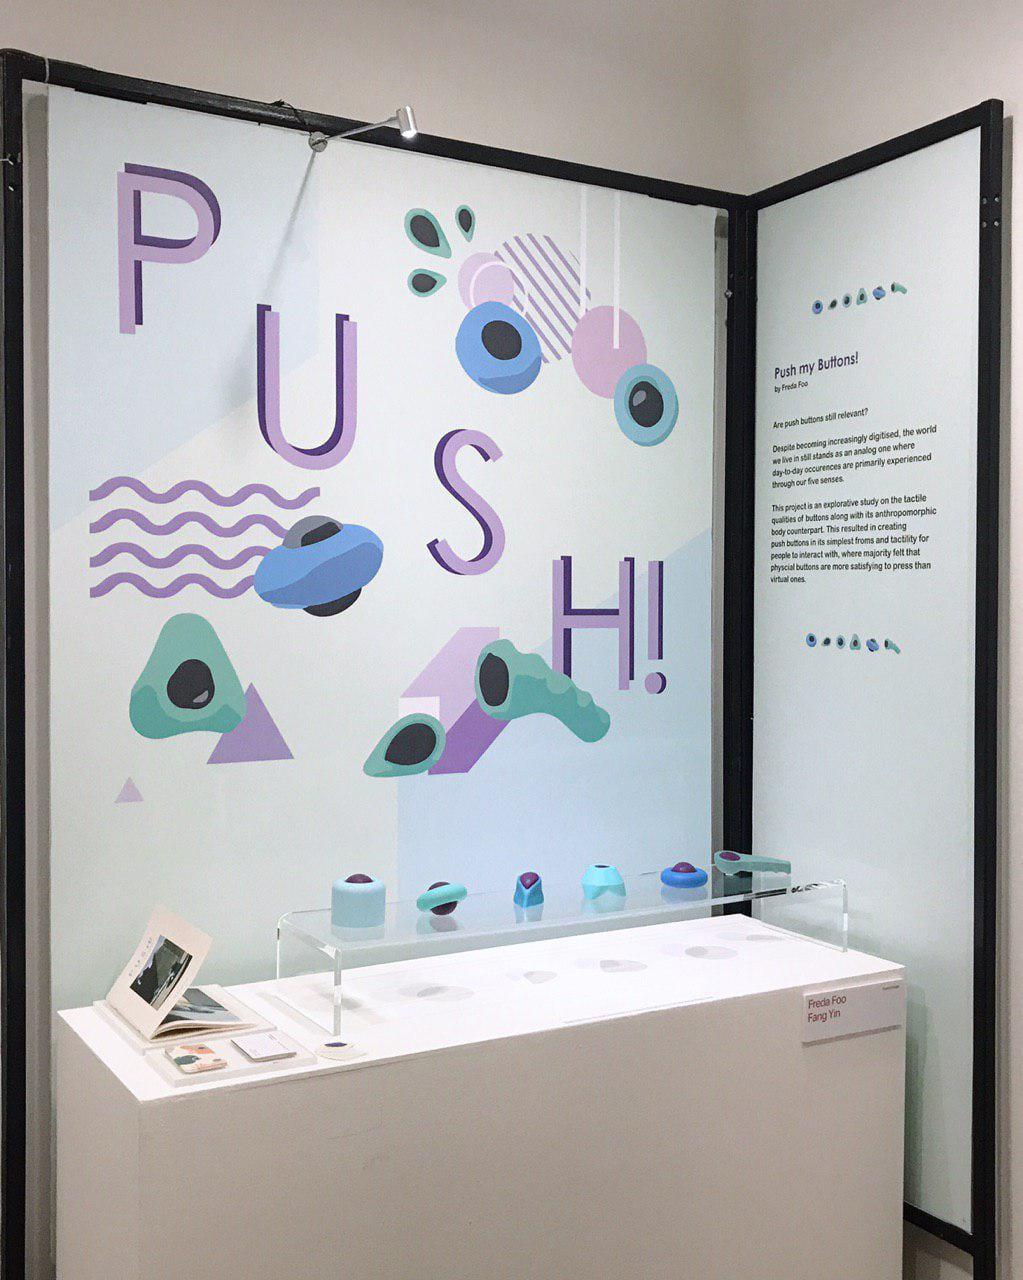 Push My Buttons! at NTU ADM Portfolio